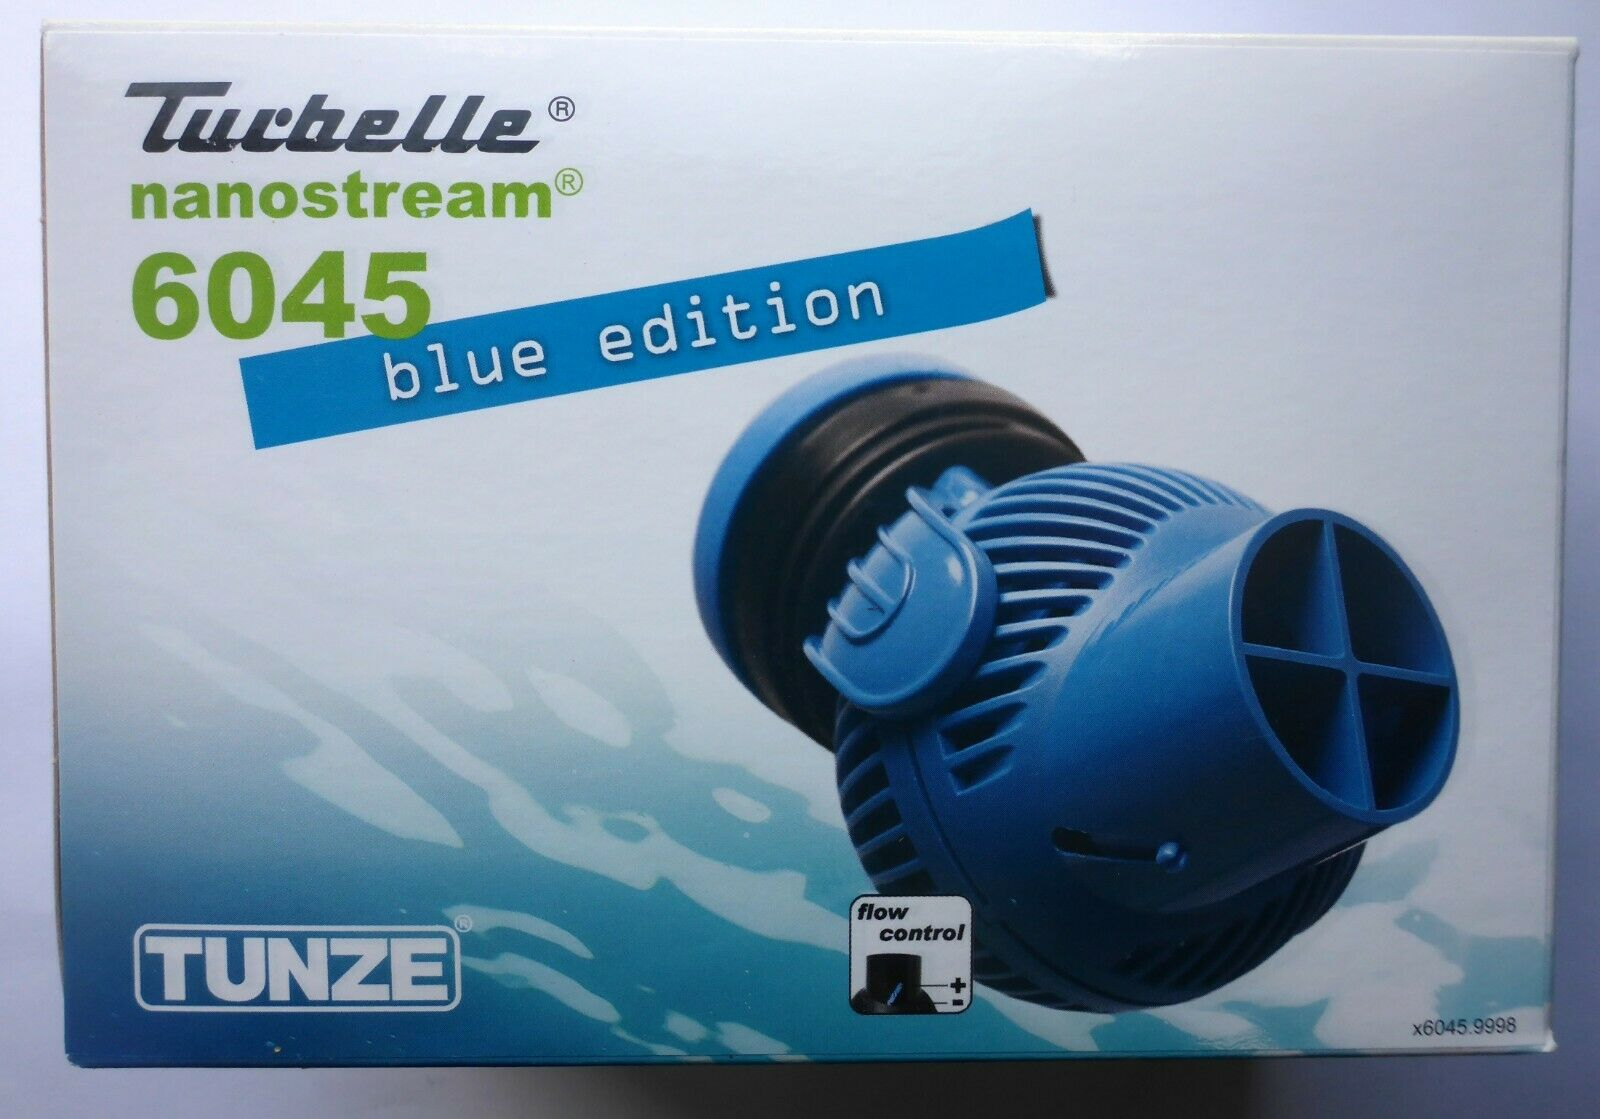 Tunze Turbelle Nanostream 6045 Blau